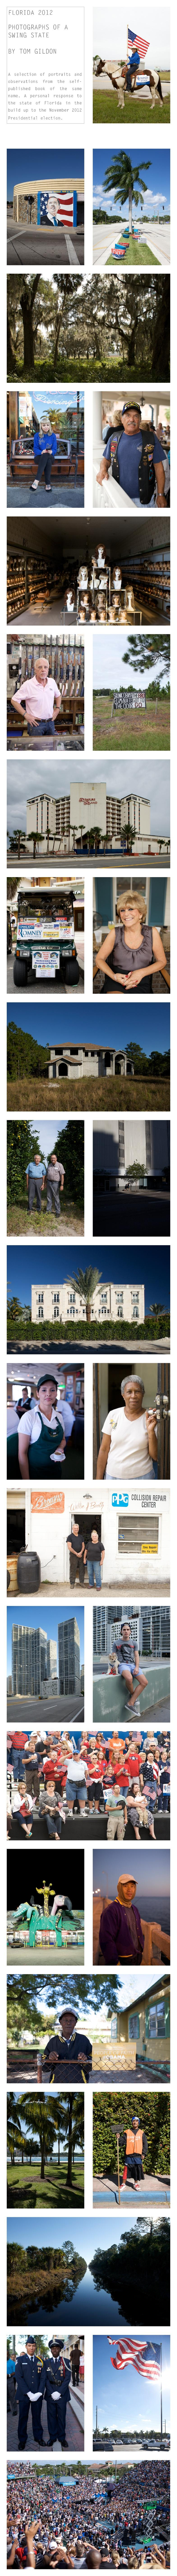 Florida 2012 edit (11)